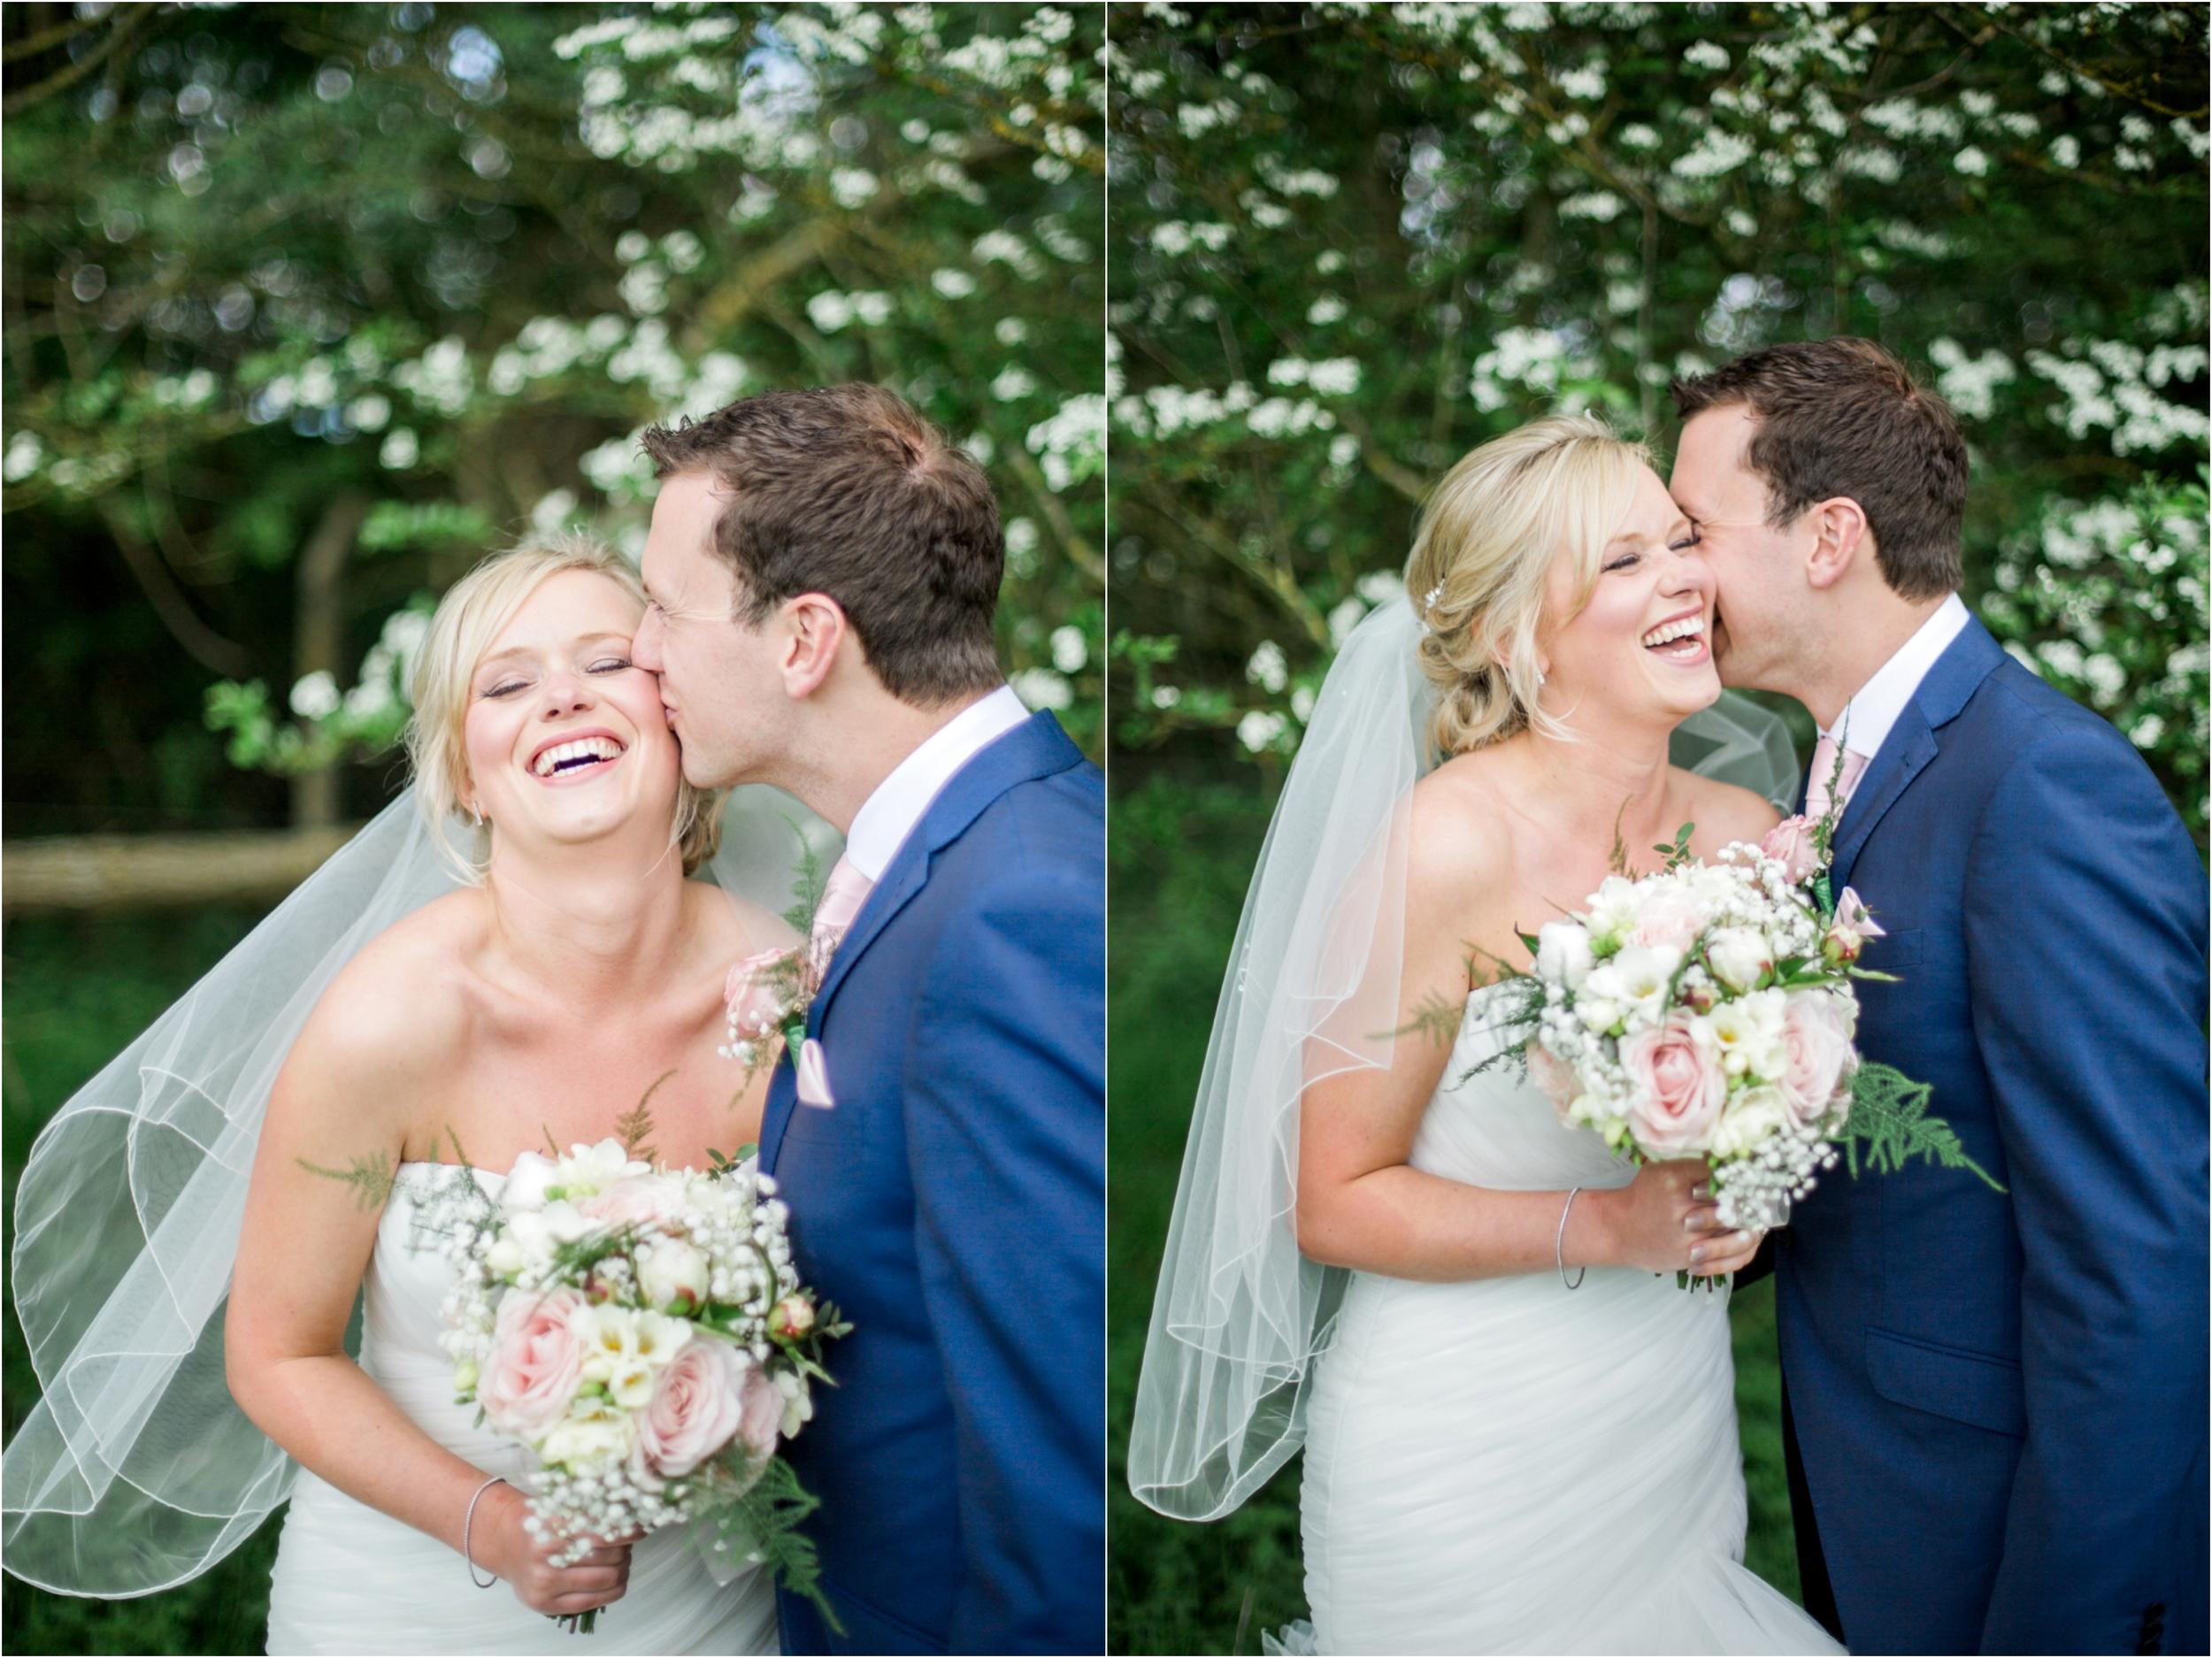 Sophie Evans Photography, GUs & Emma Farm Wedding, Warwick boys school wedding, Warwickshire wedding photographer-6.jpg